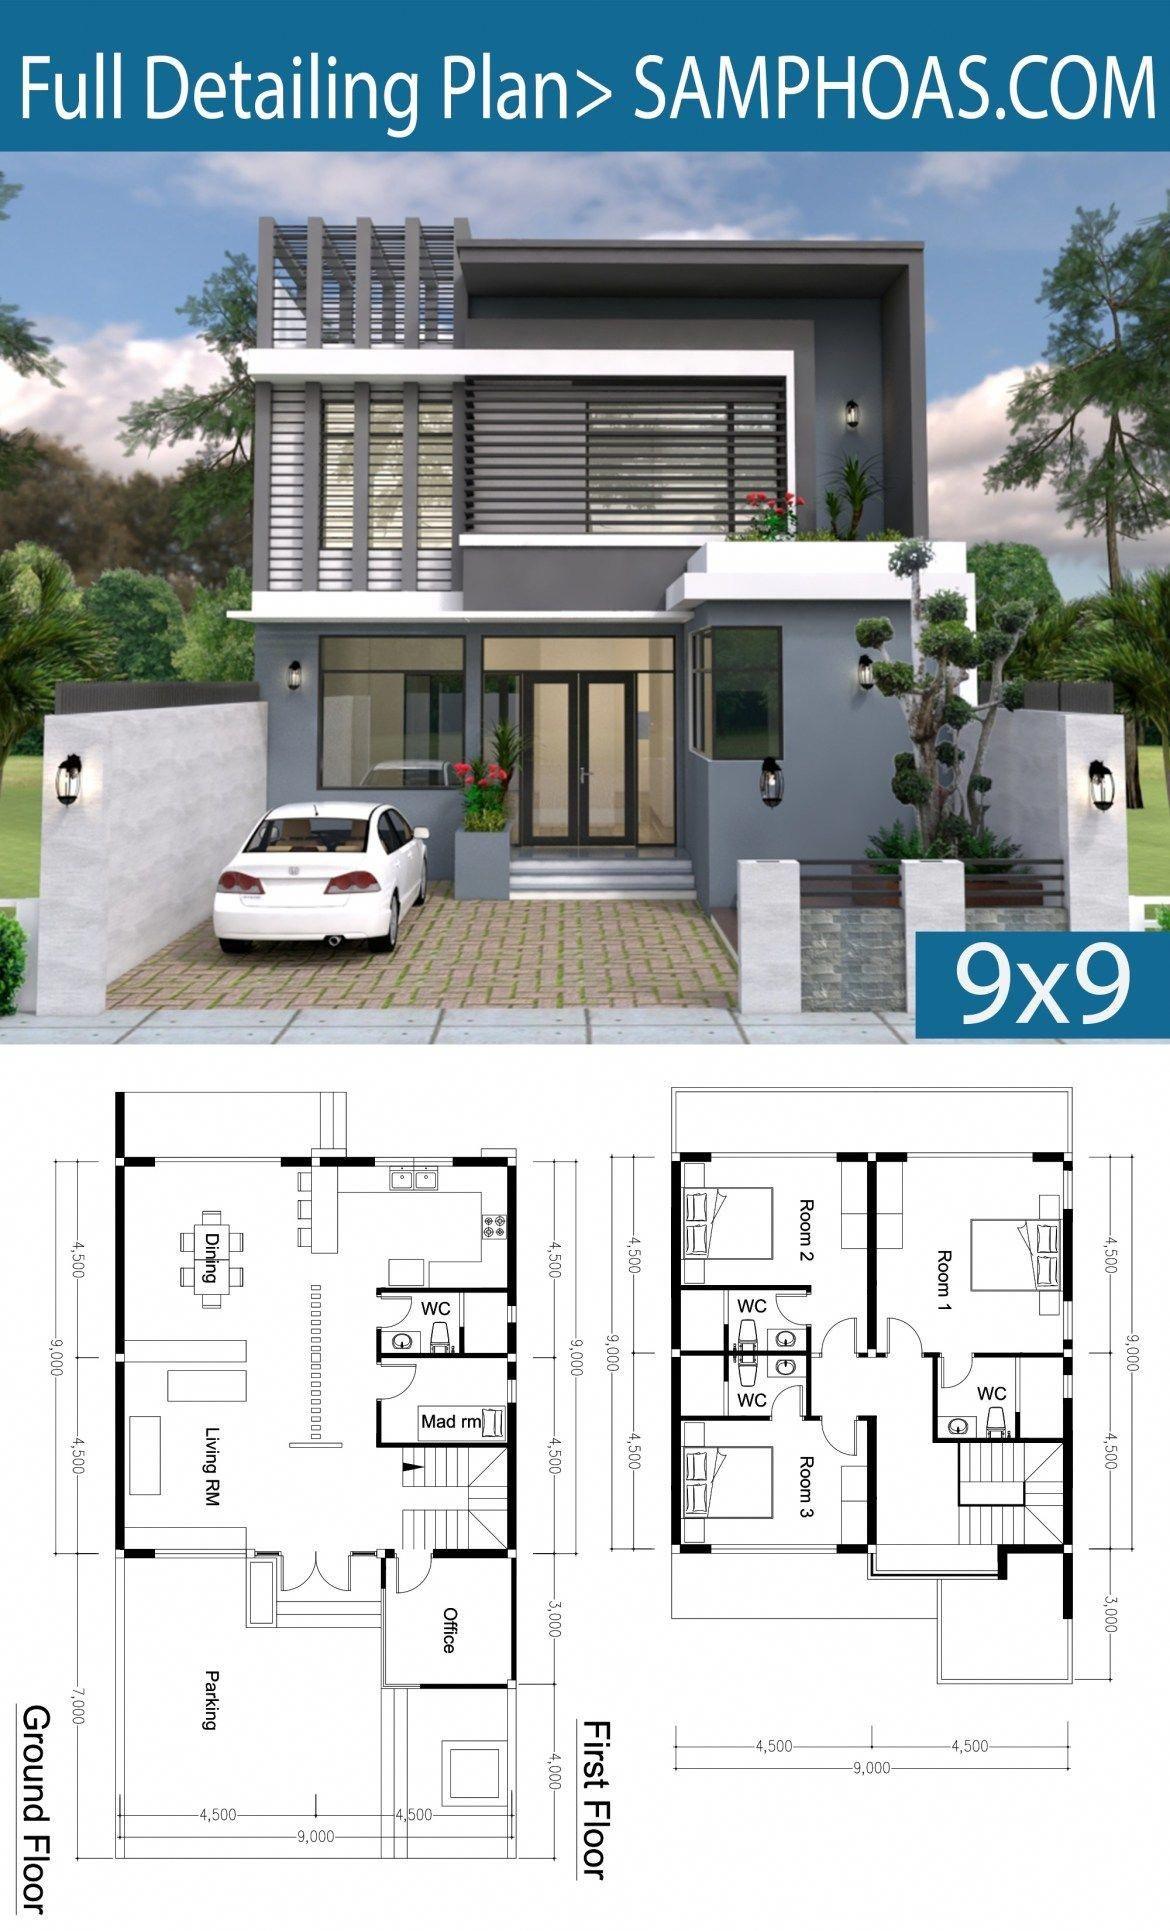 Modern Home Design India Modernhomedesign Modern House Floor Plans Architectural House Plans Modern House Plans